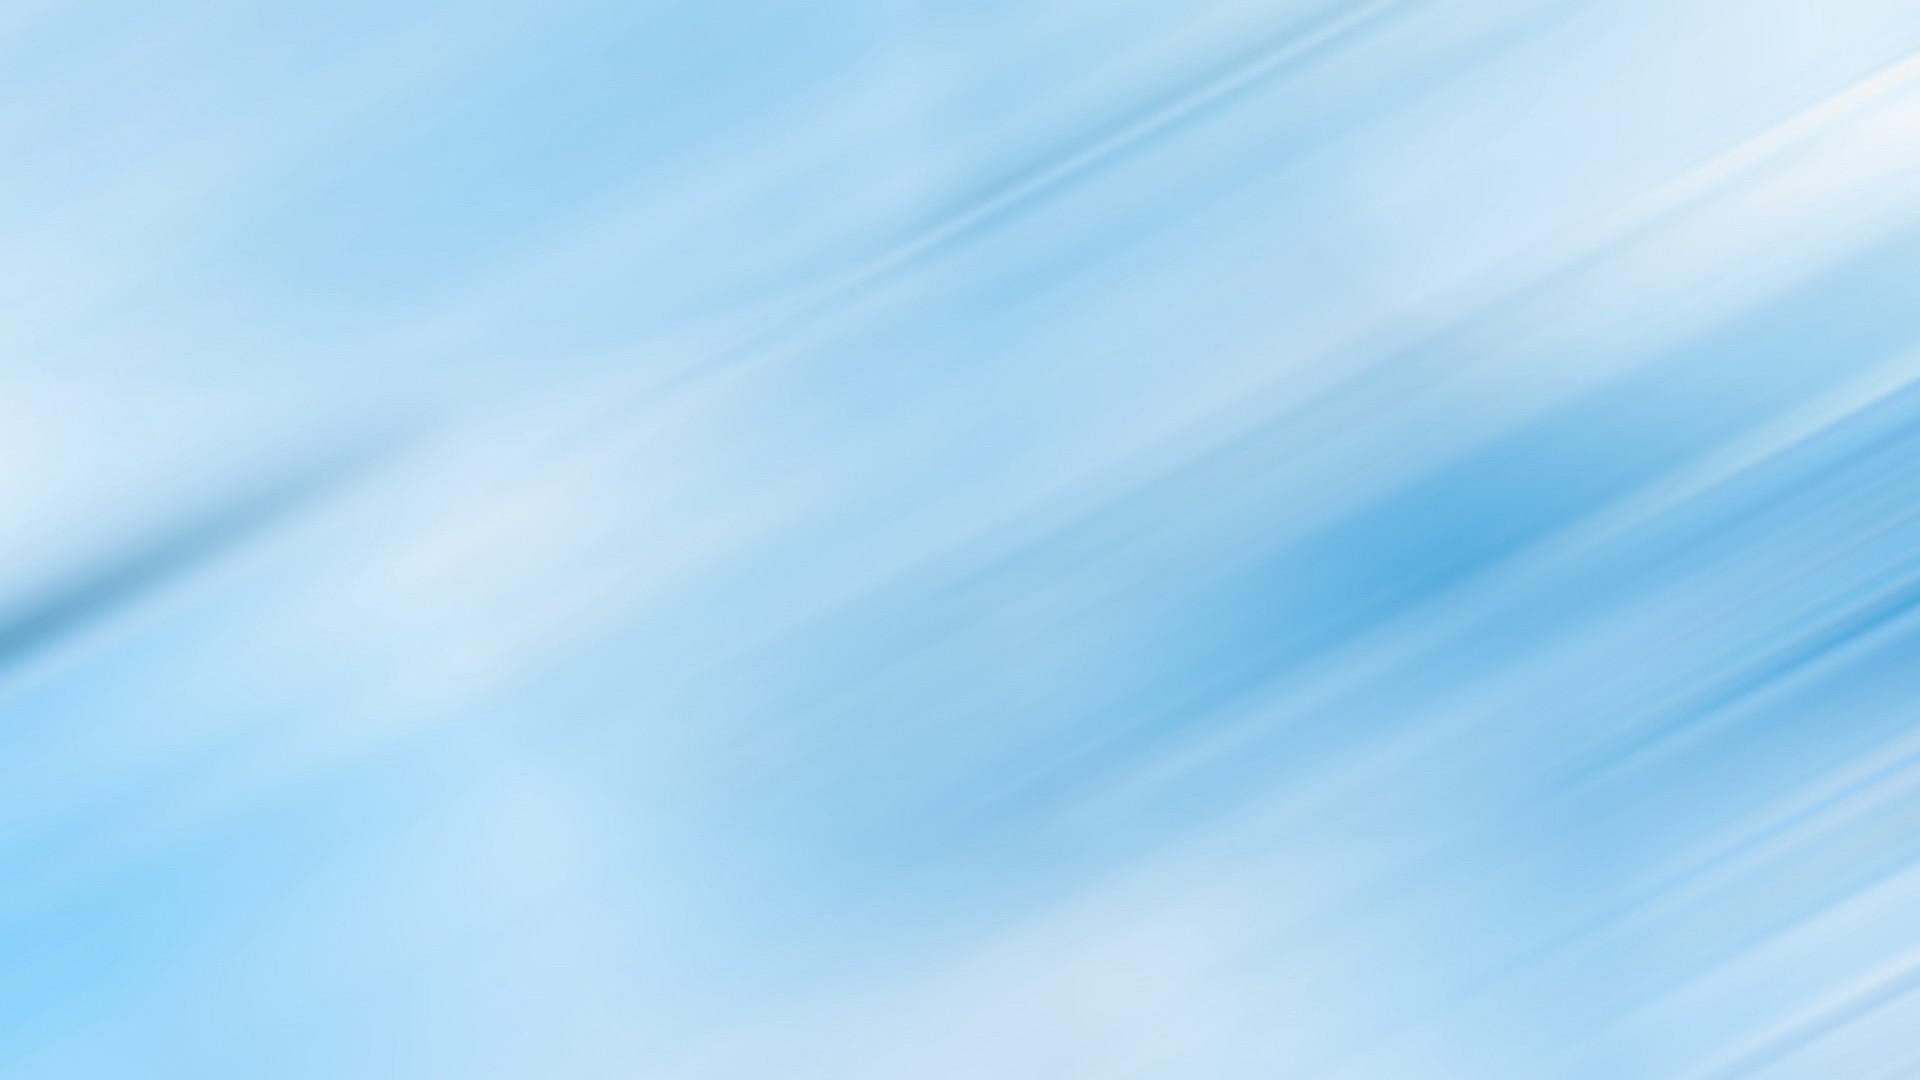 Blue Background Download Free Awesome Backgrounds For Desktop